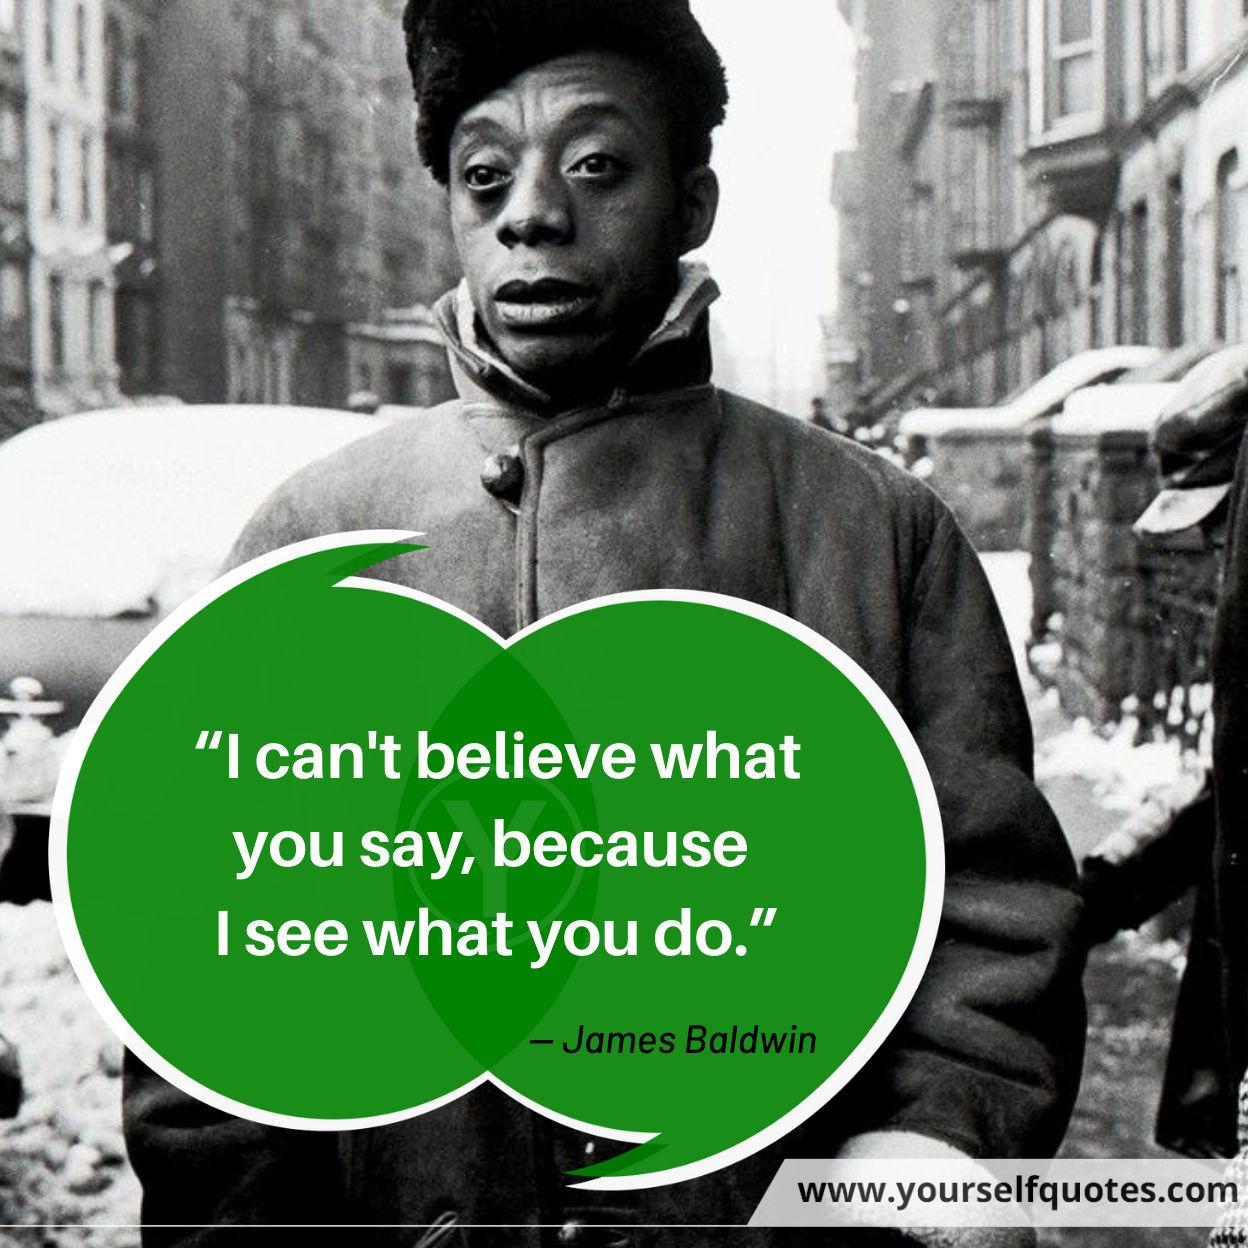 James Baldwin Quote Images